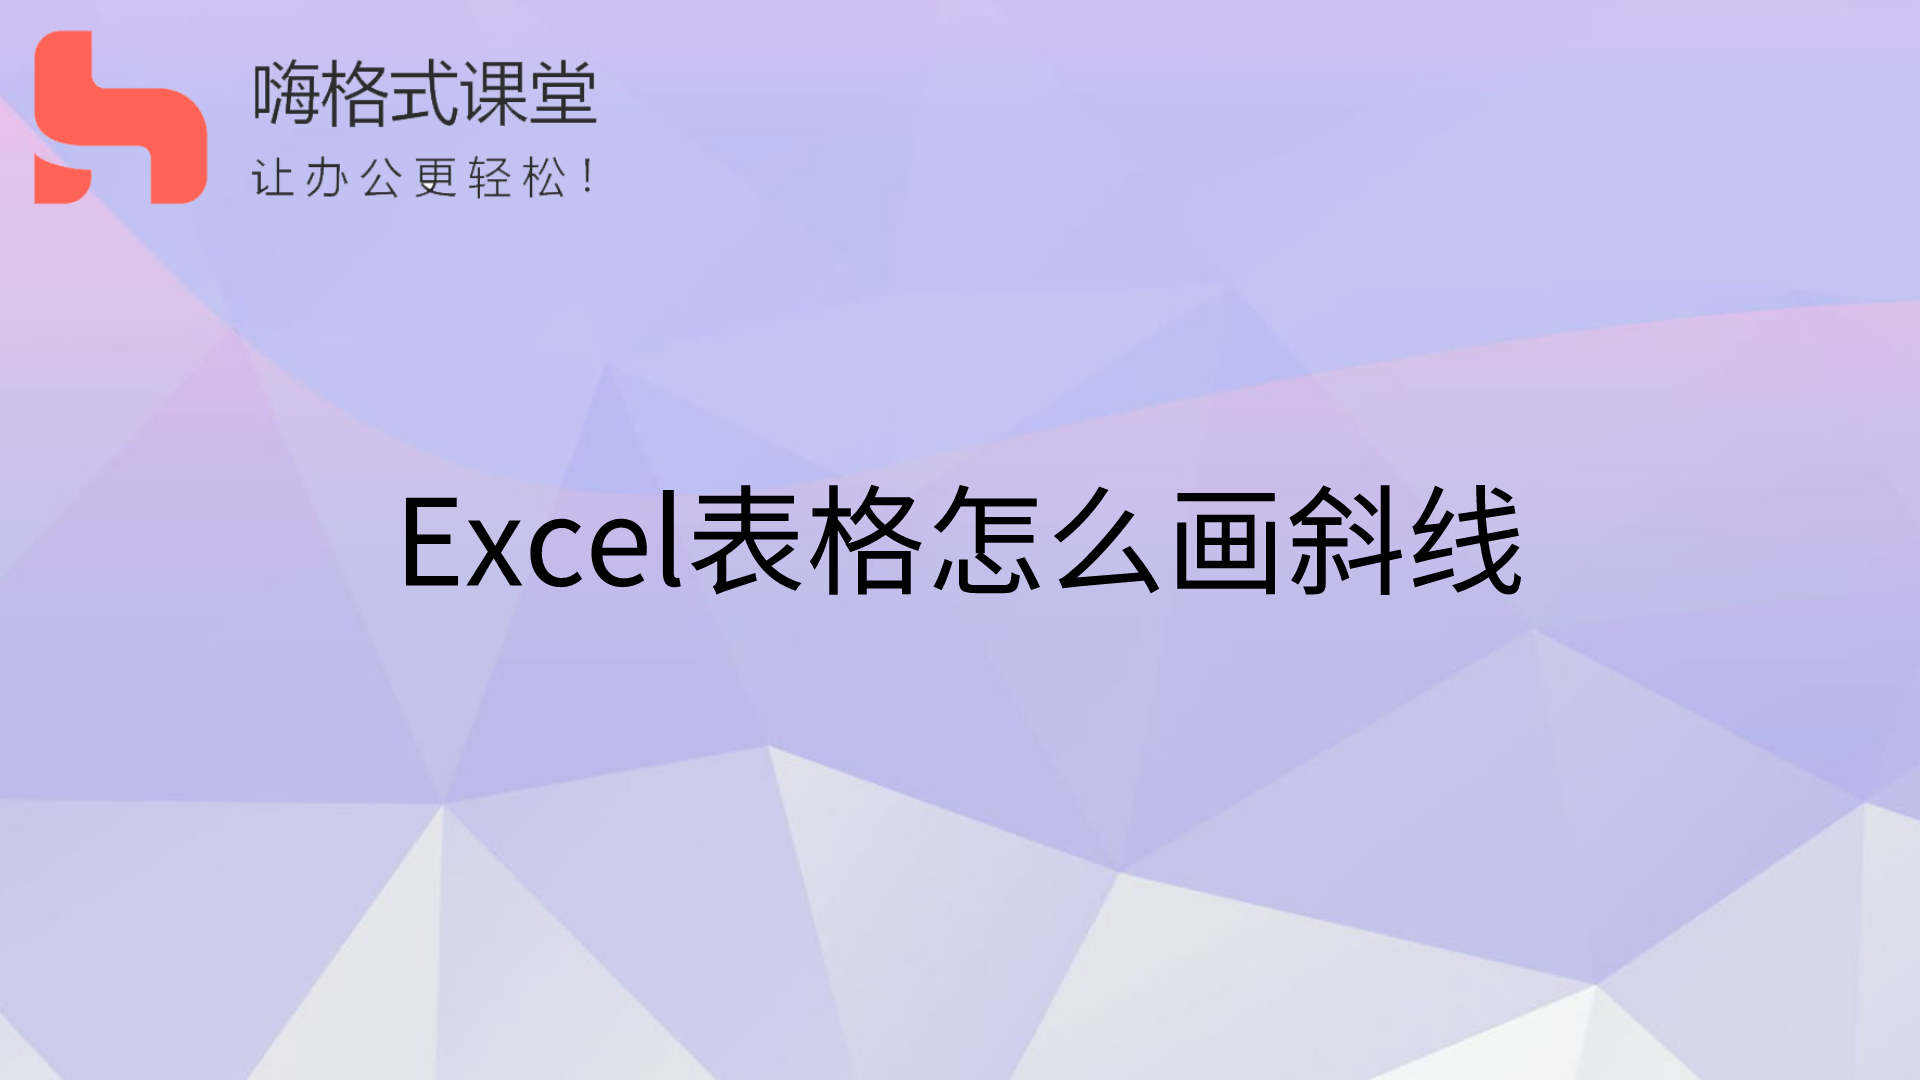 Excel表格怎么画斜线